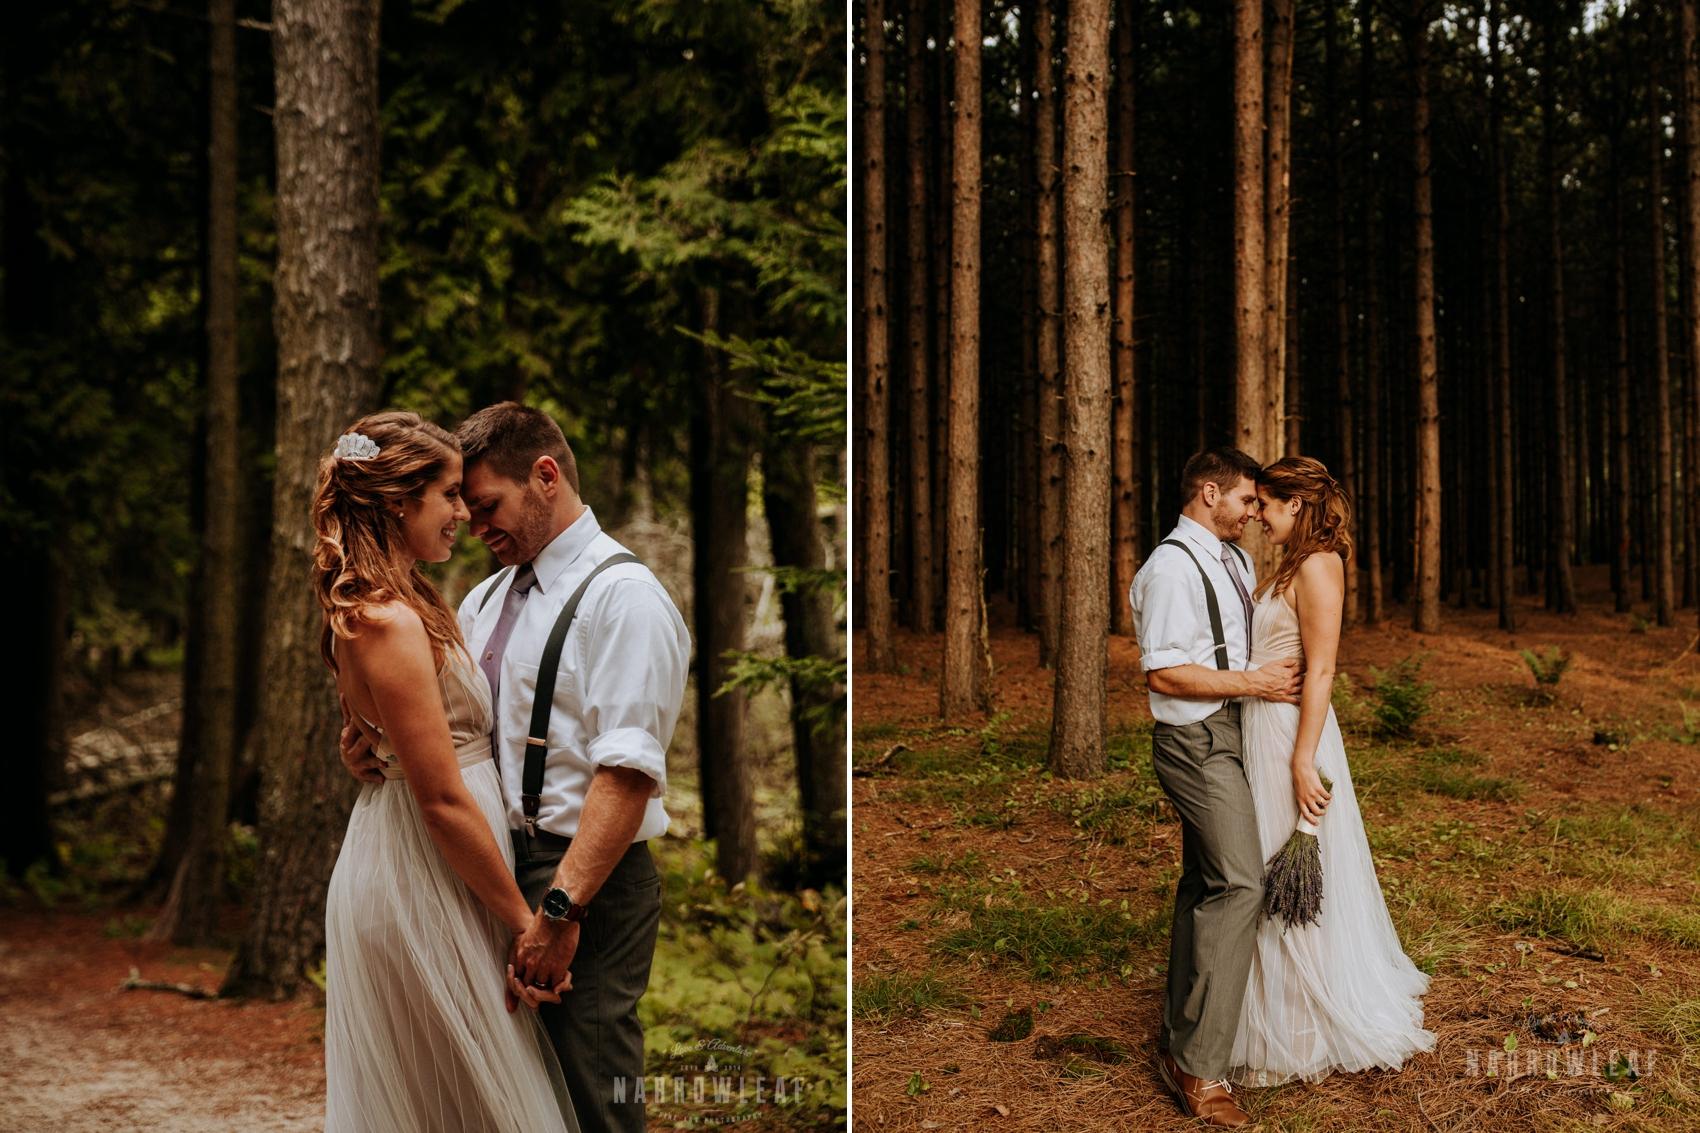 wisconsin-wedding-photographer-woodsy-narrowleaf-photography005-006.jpg